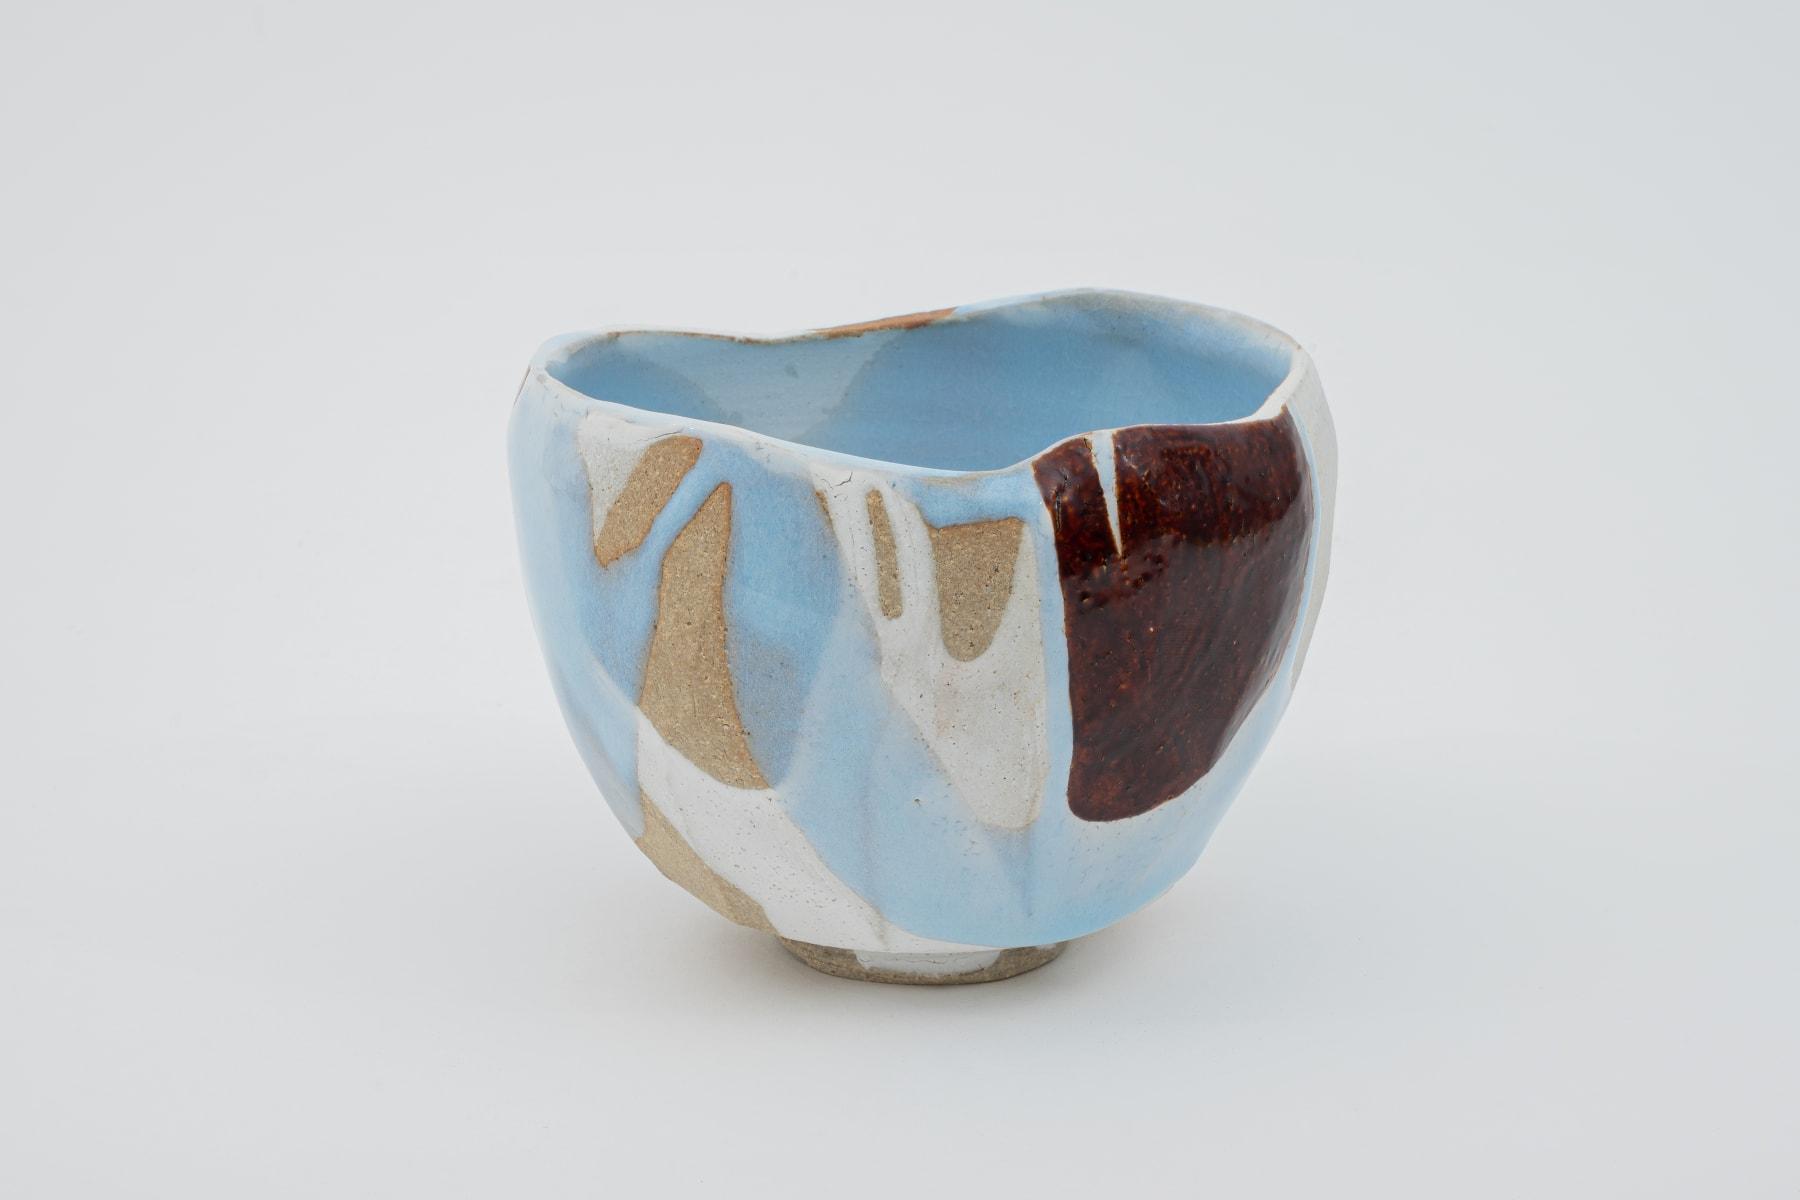 Hosai Matsubayashi XVI, Geppaku glaze with lacquer / 茶盌 陶漆合作 塗 西村圭功, 2020